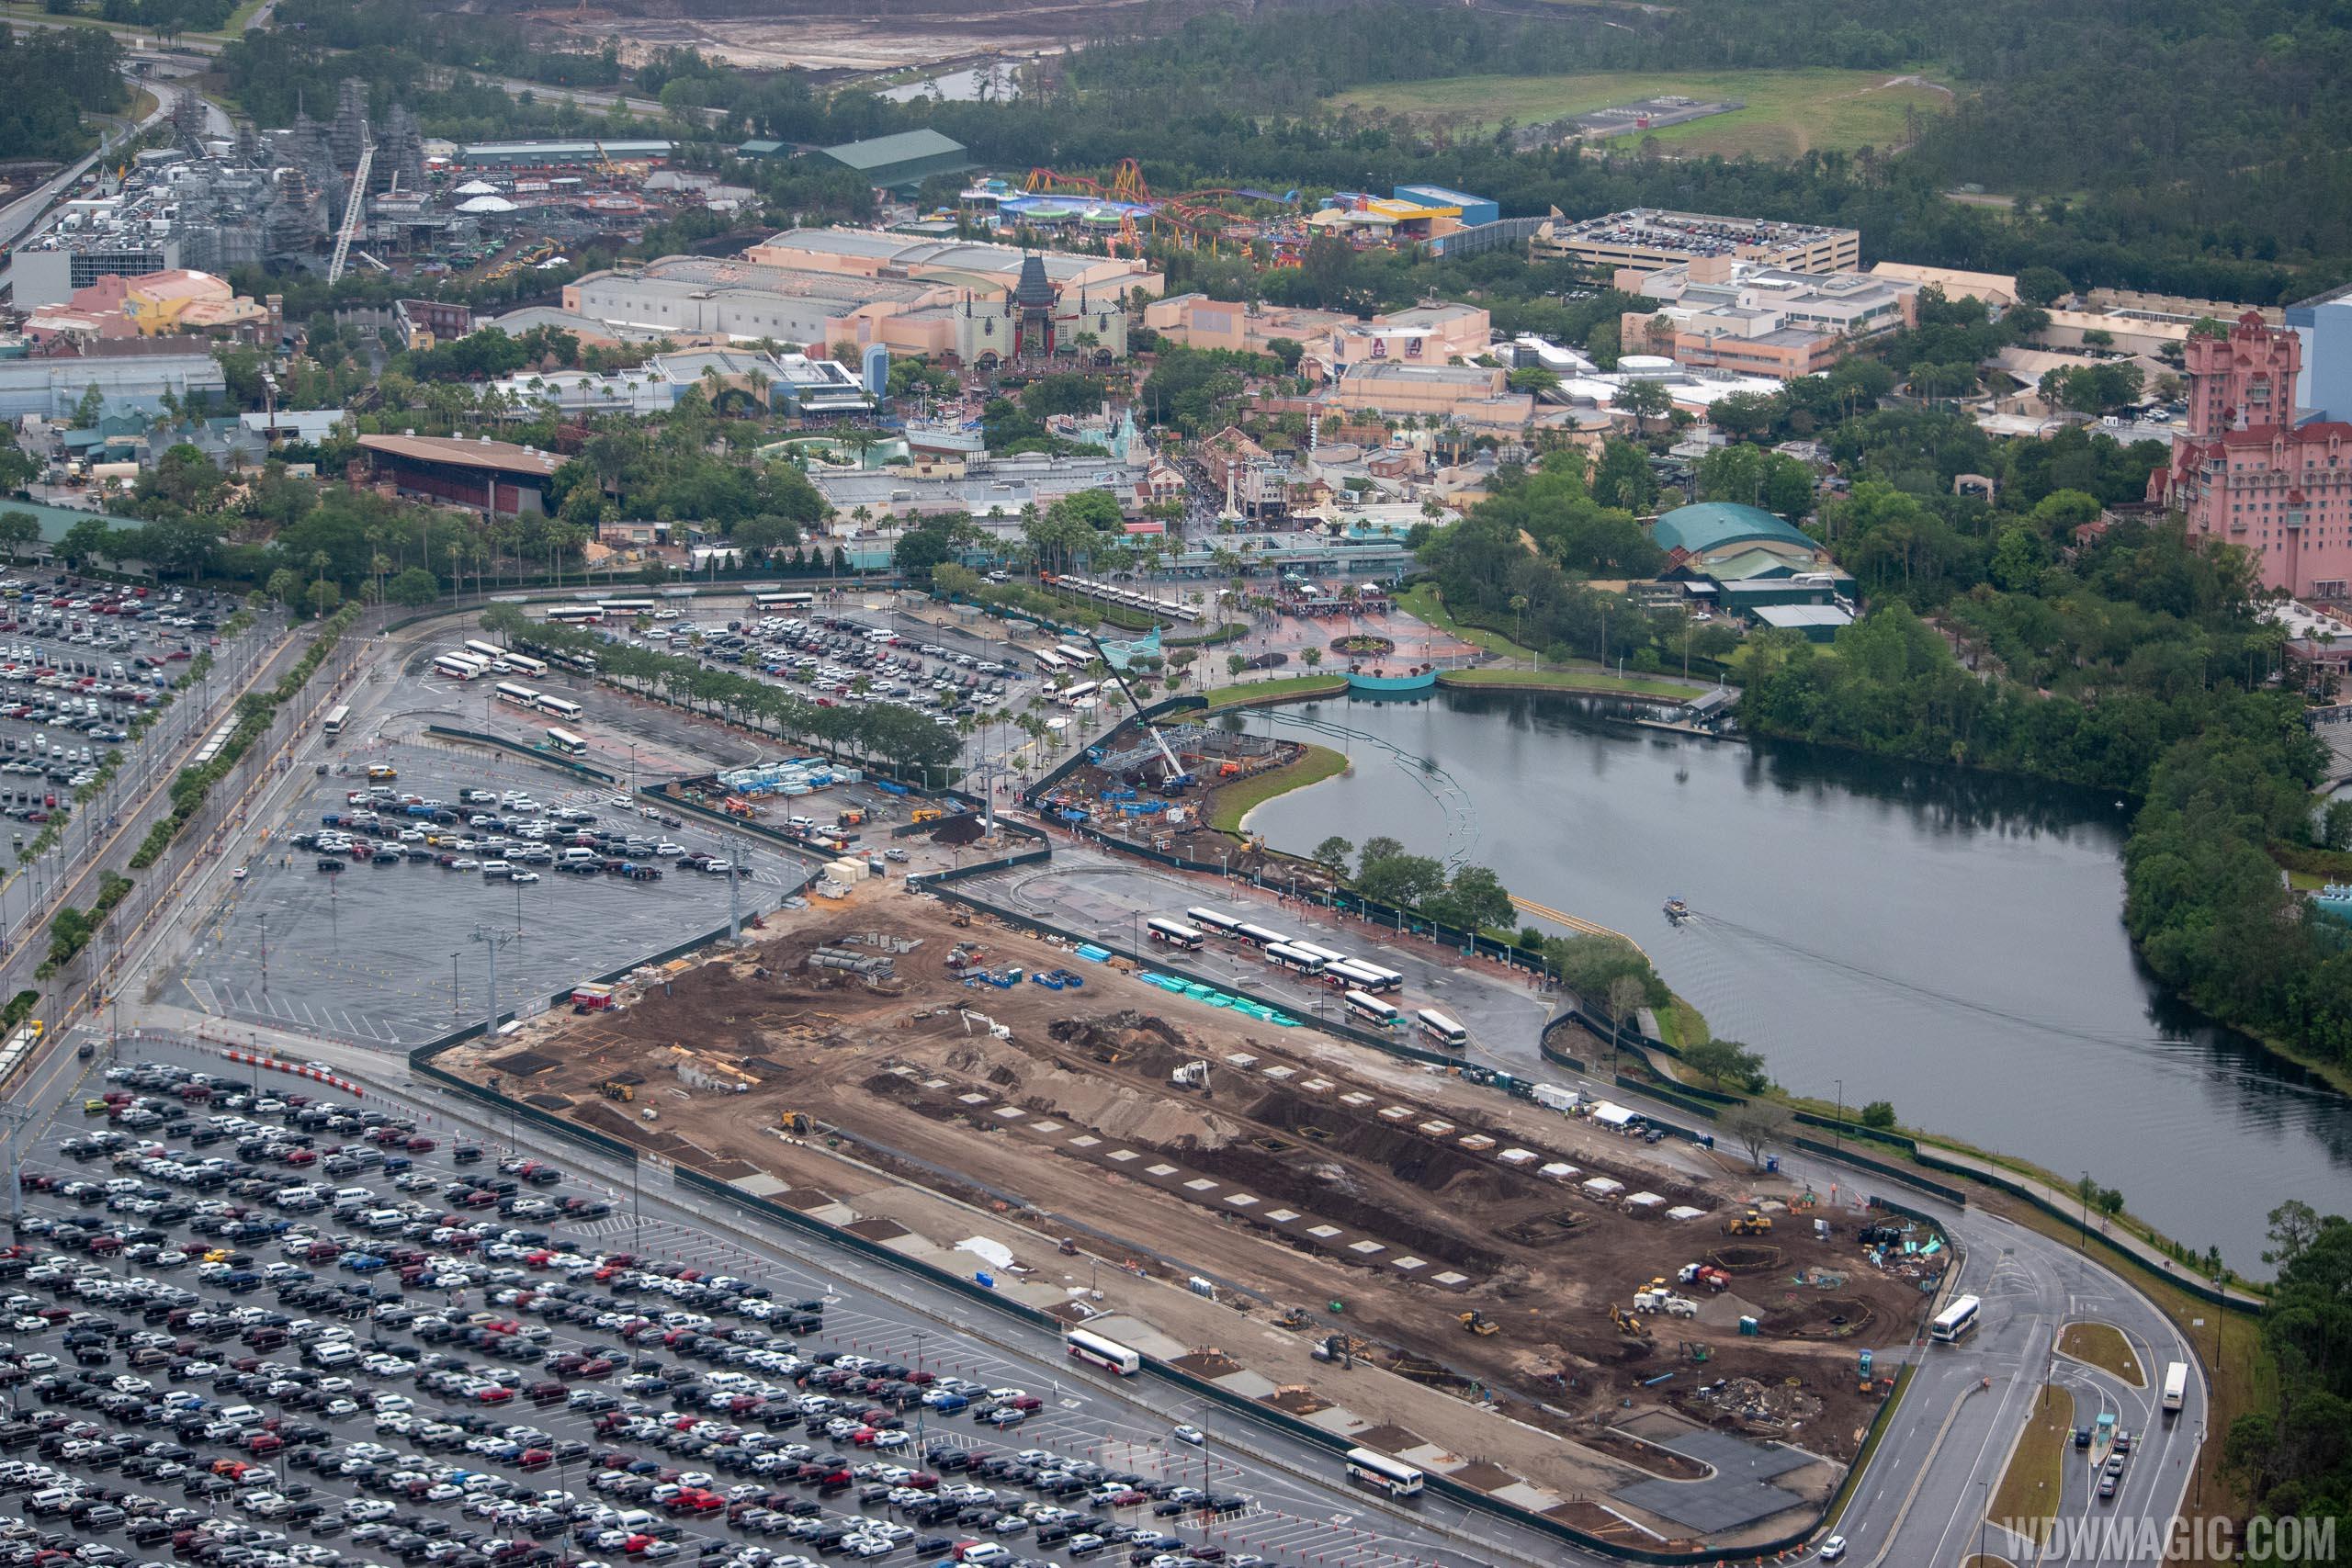 Disney Skyliner construction aerial views - May 2018